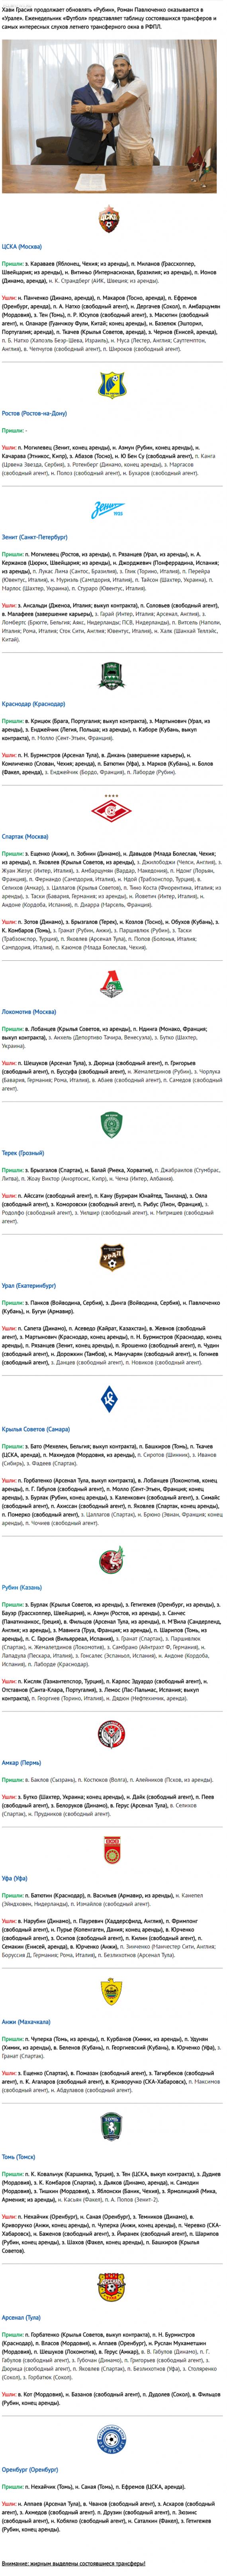 РФПЛ. Таблица трансферов-2016/2017